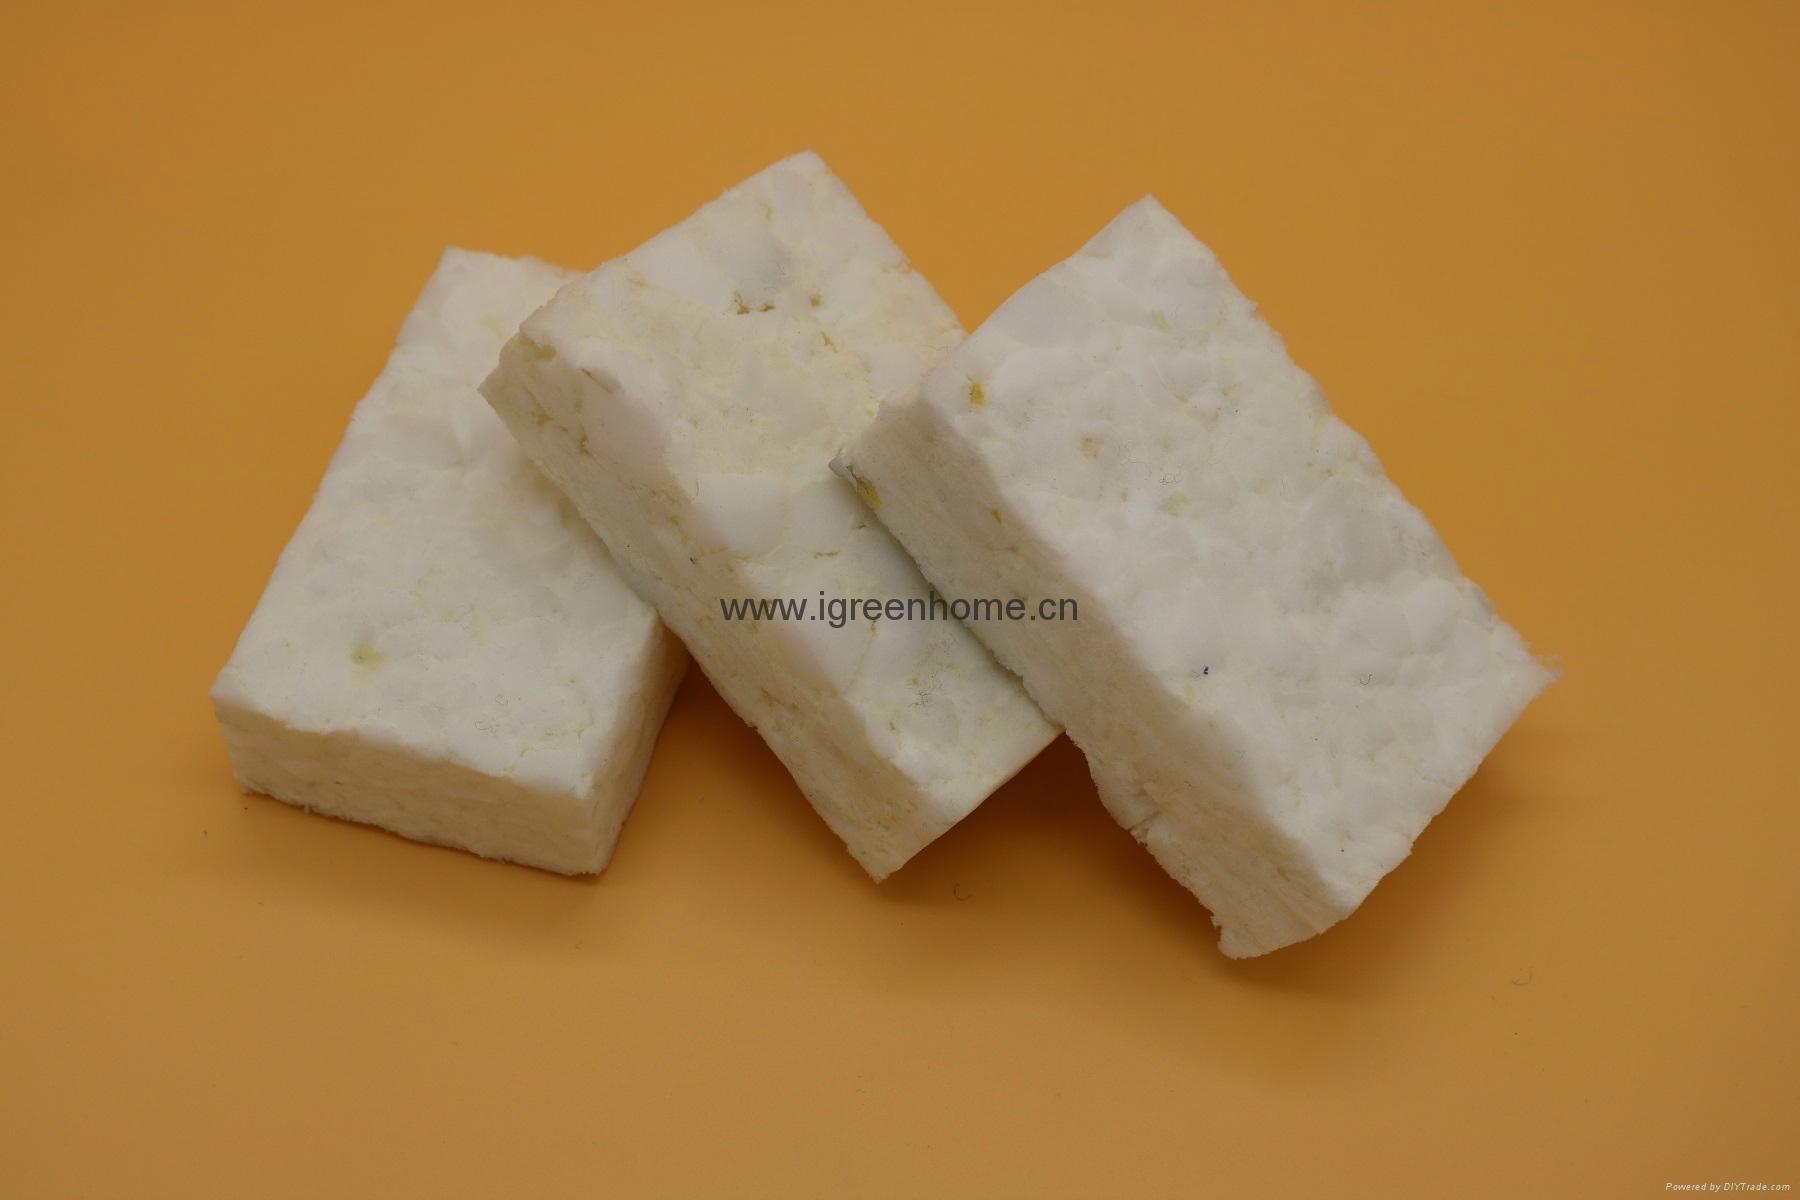 regenerative melamine sponge 2